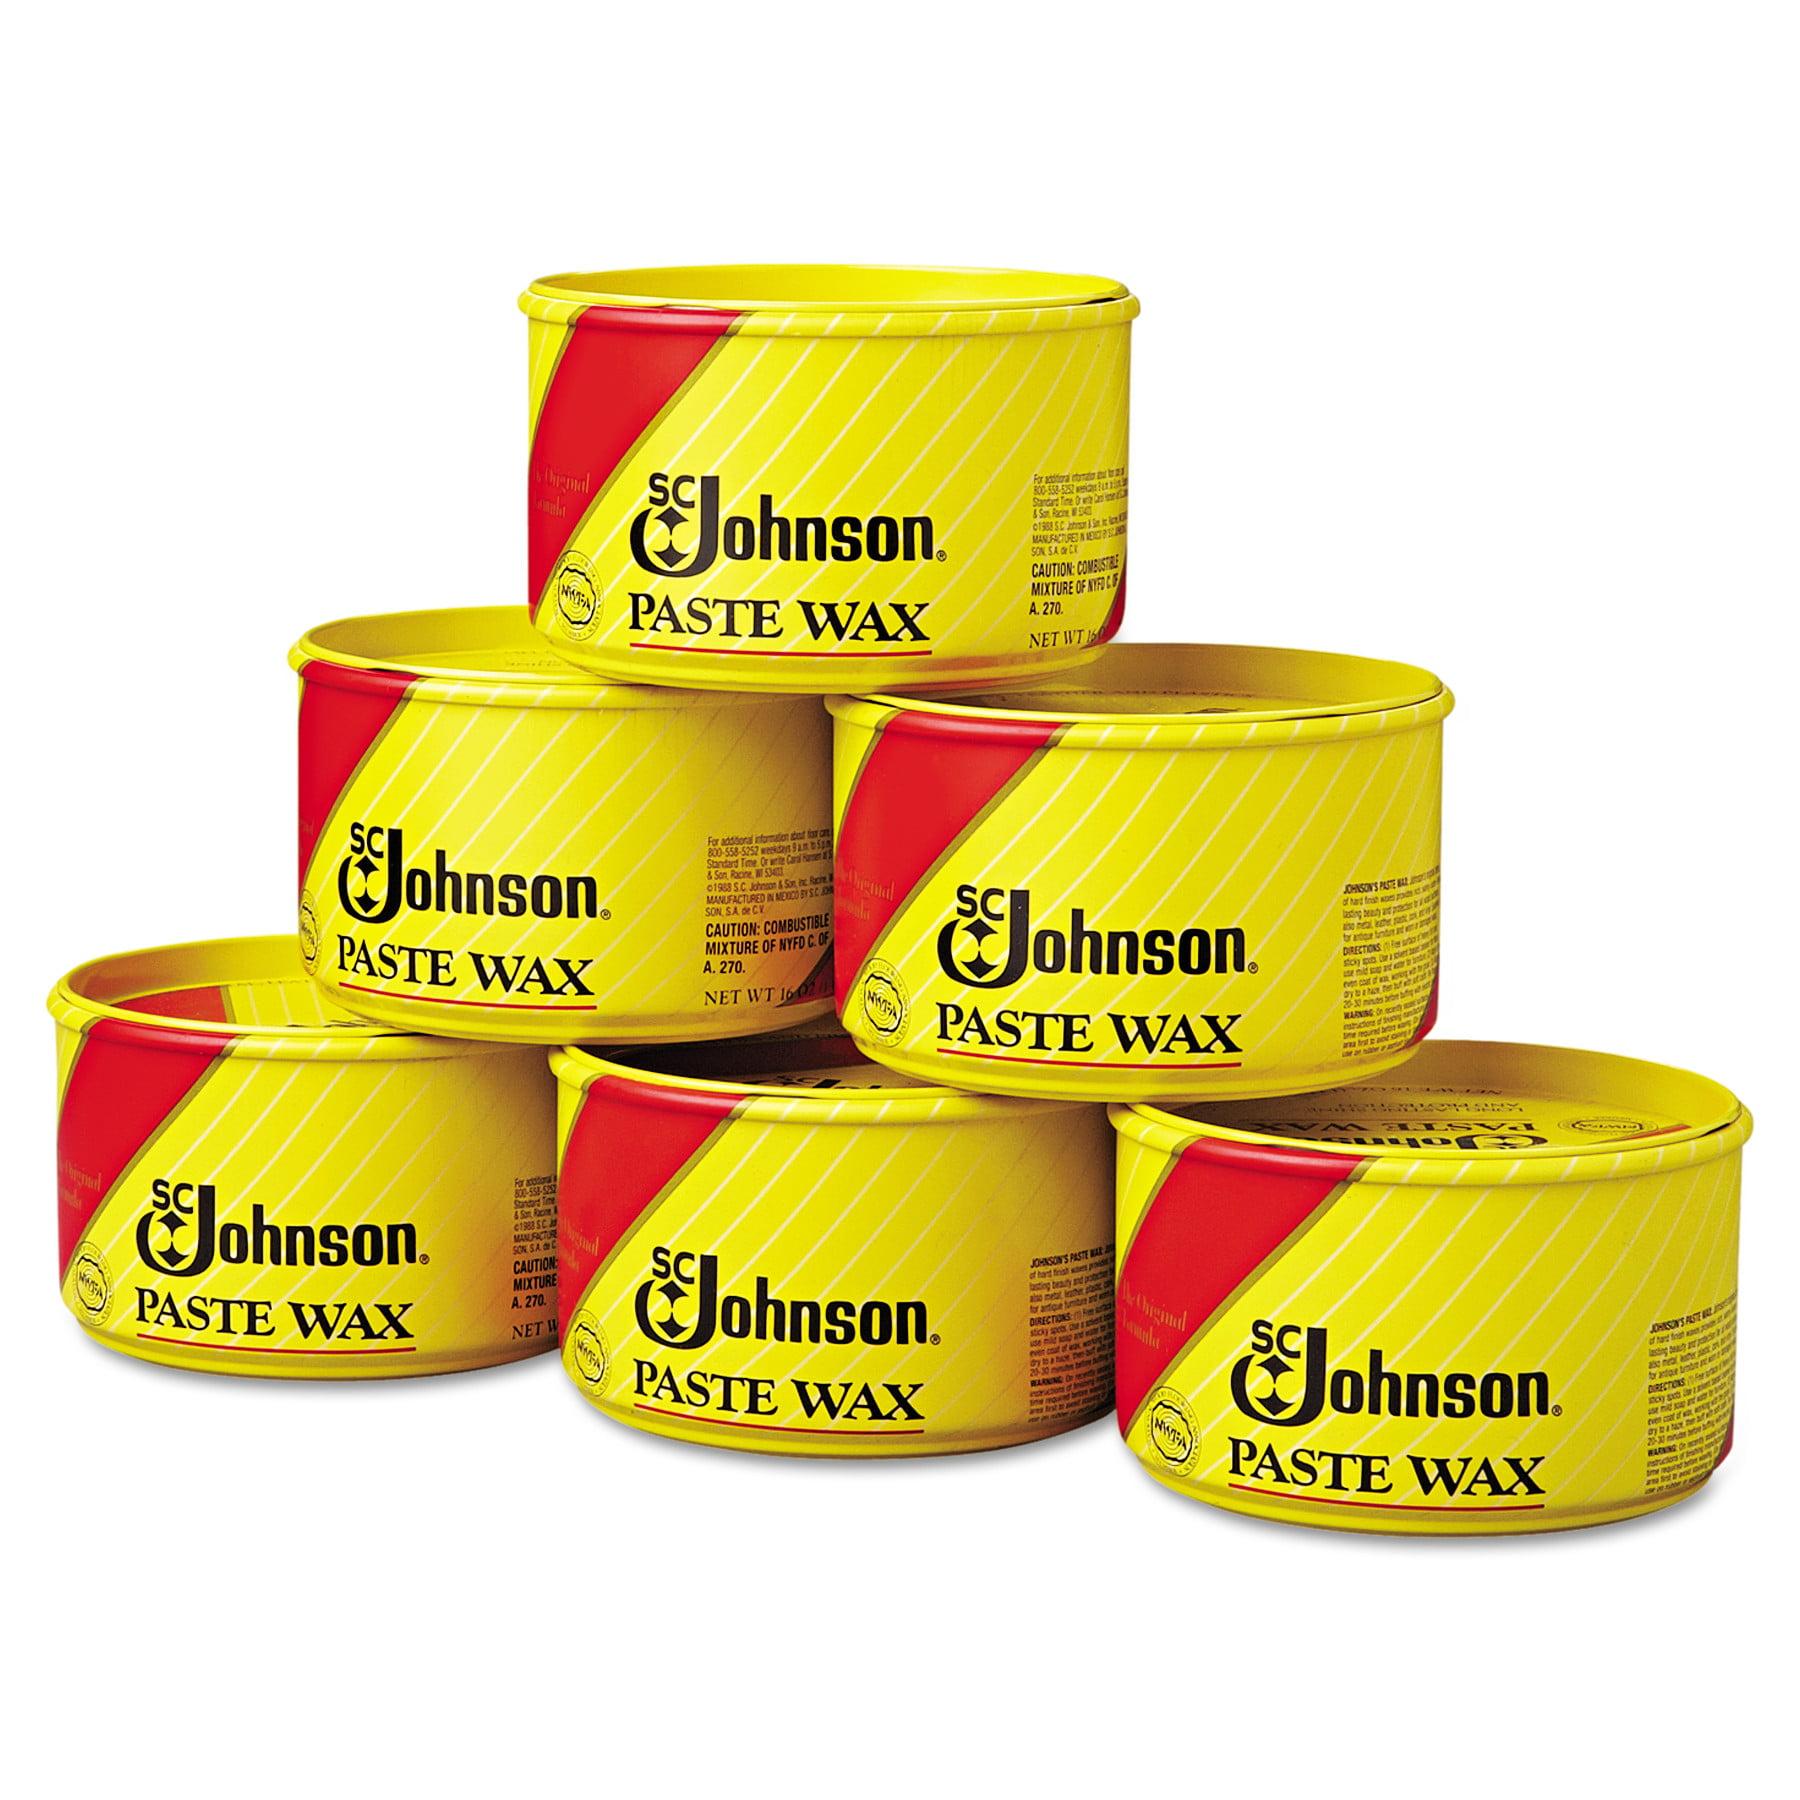 SC Johnson Paste Wax, Multi Purpose Floor Protector, 16oz Tub, 6/Carton    Walmart.com